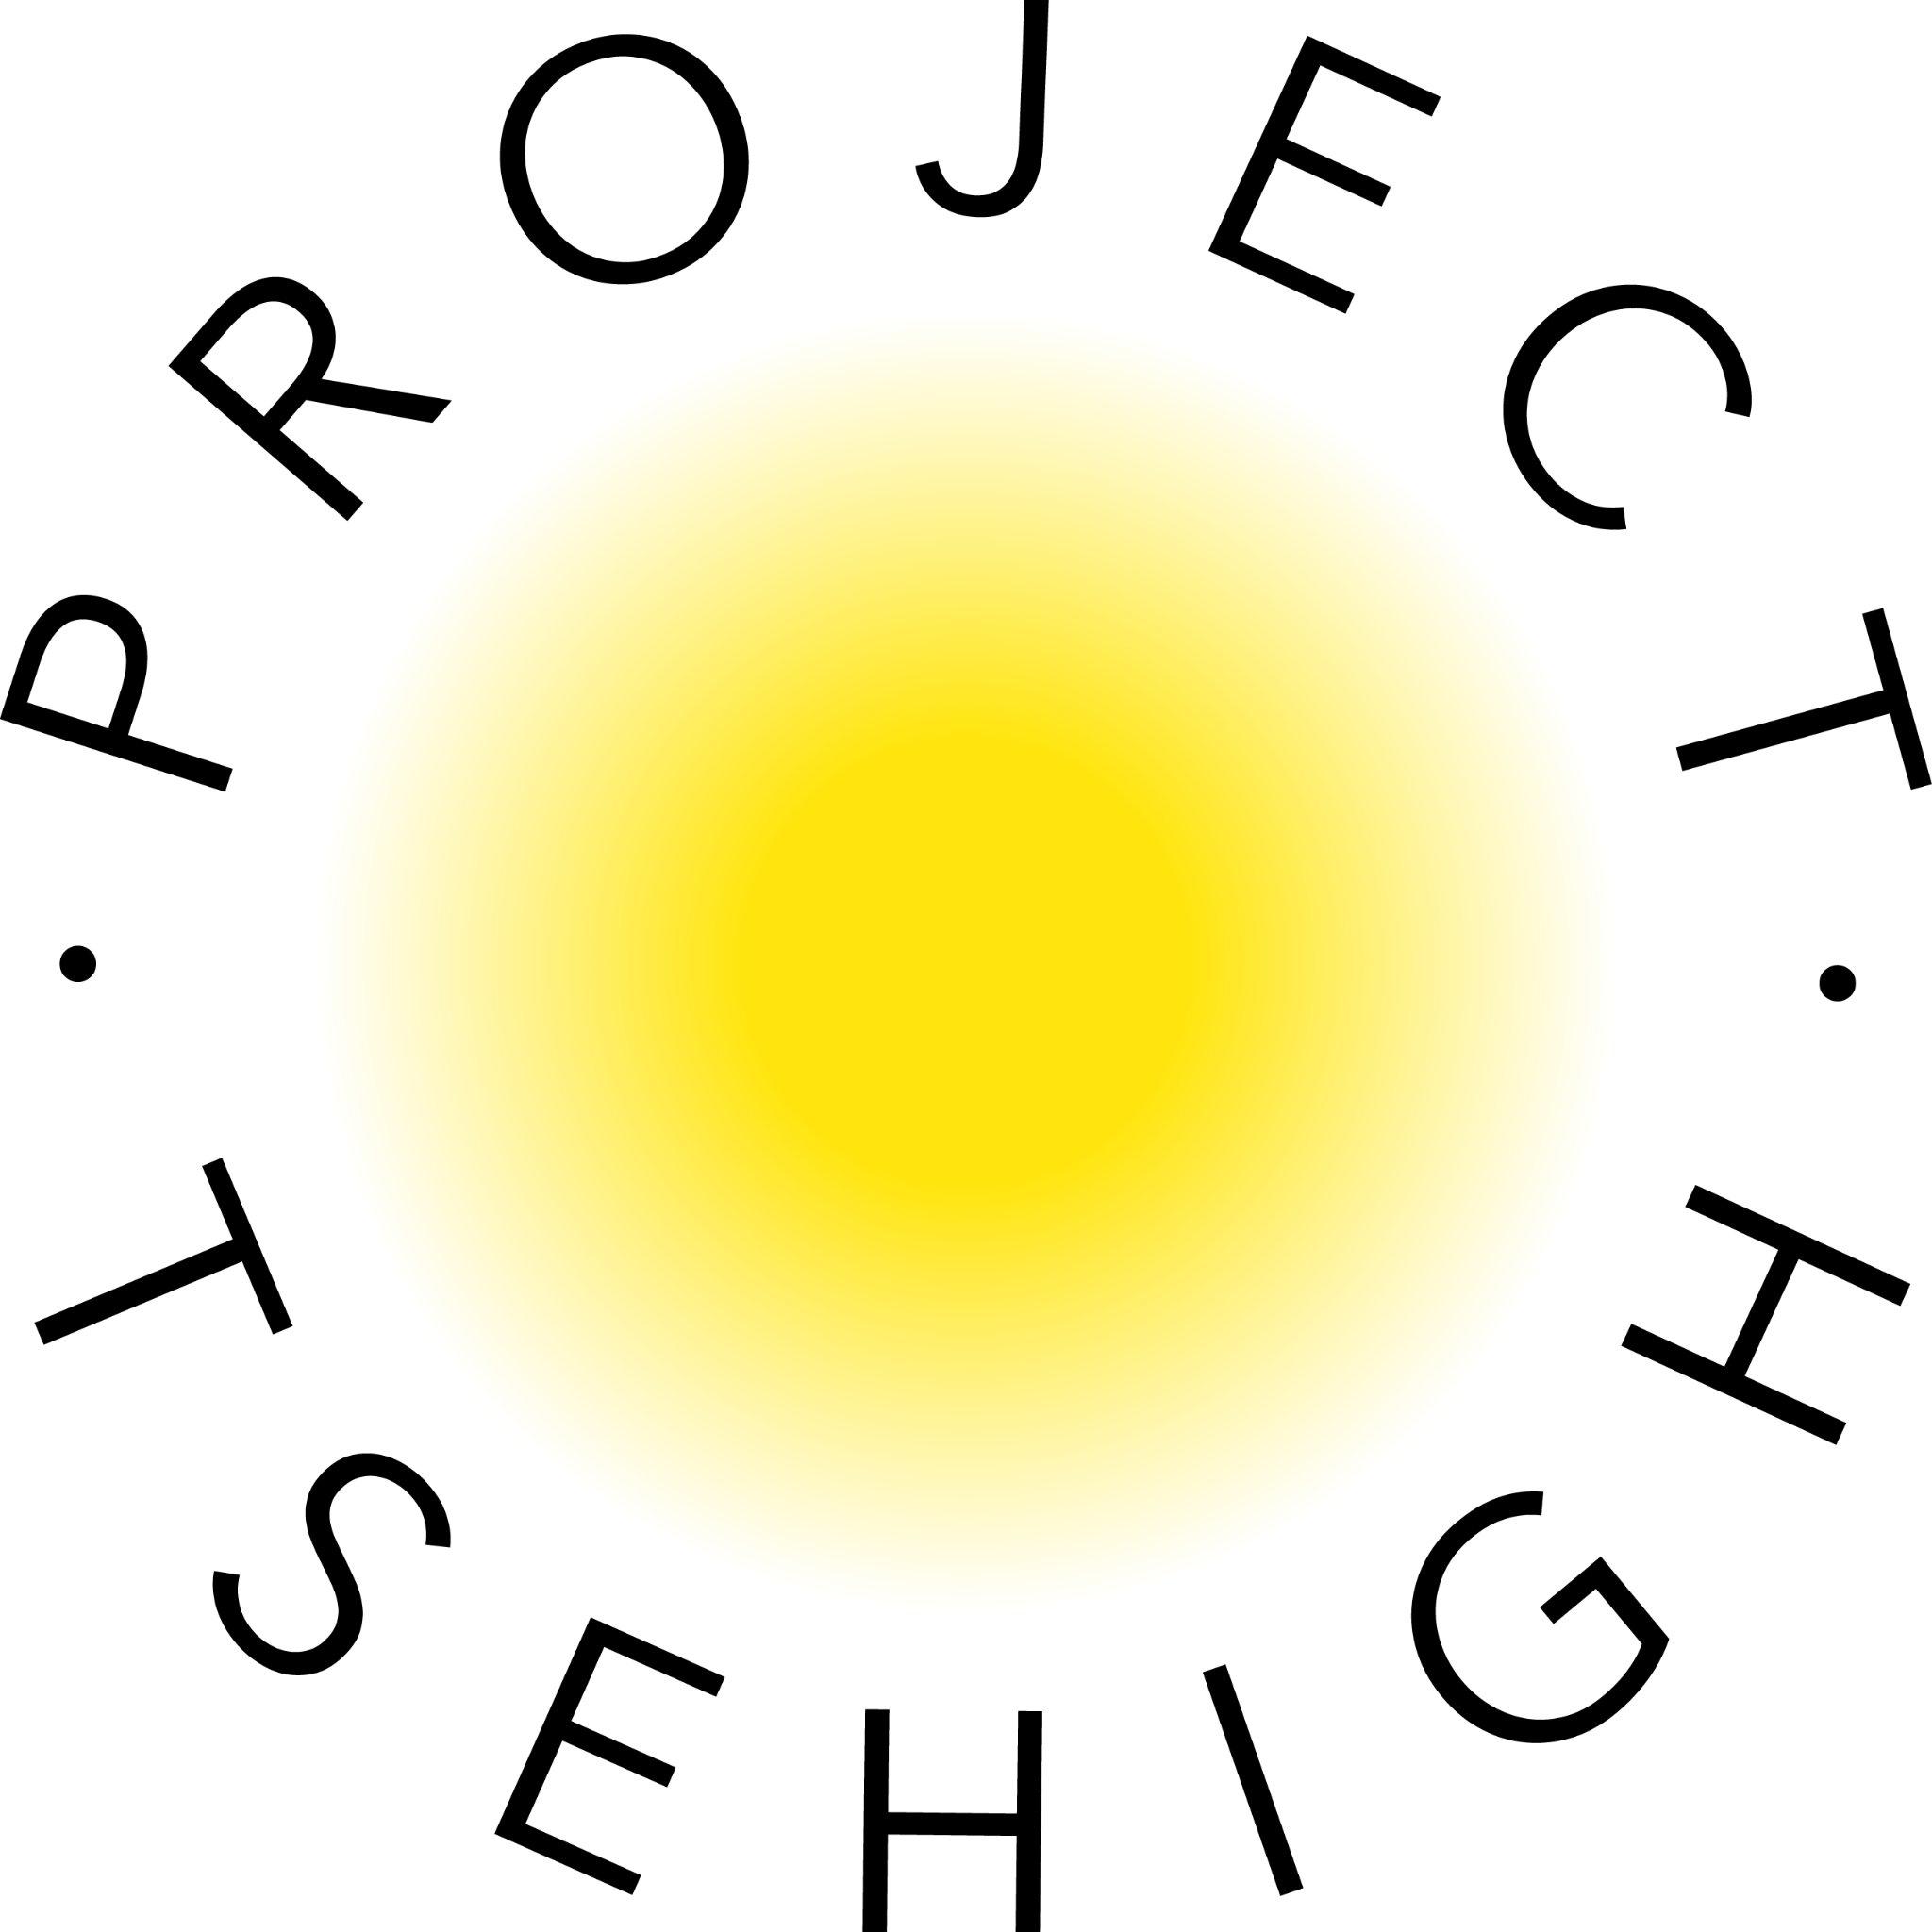 Project Tsehigh